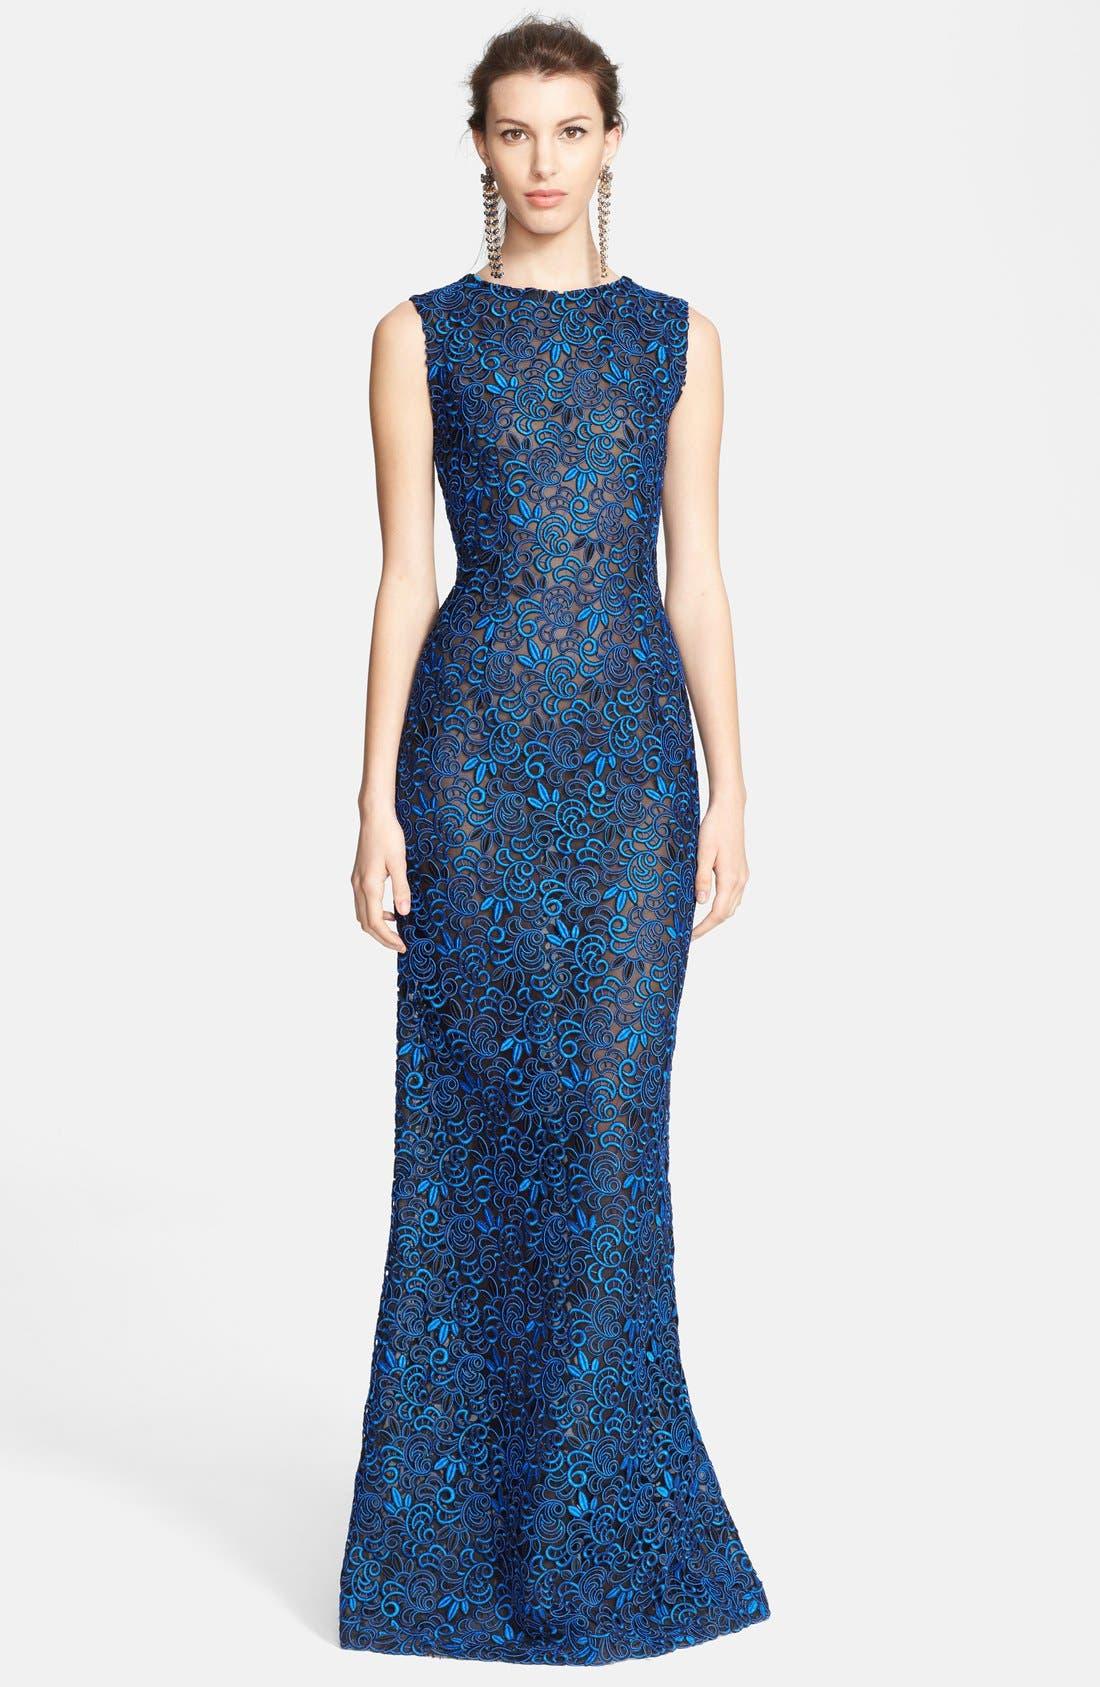 Main Image - Oscar de la Renta Embroidered Silk Column Gown